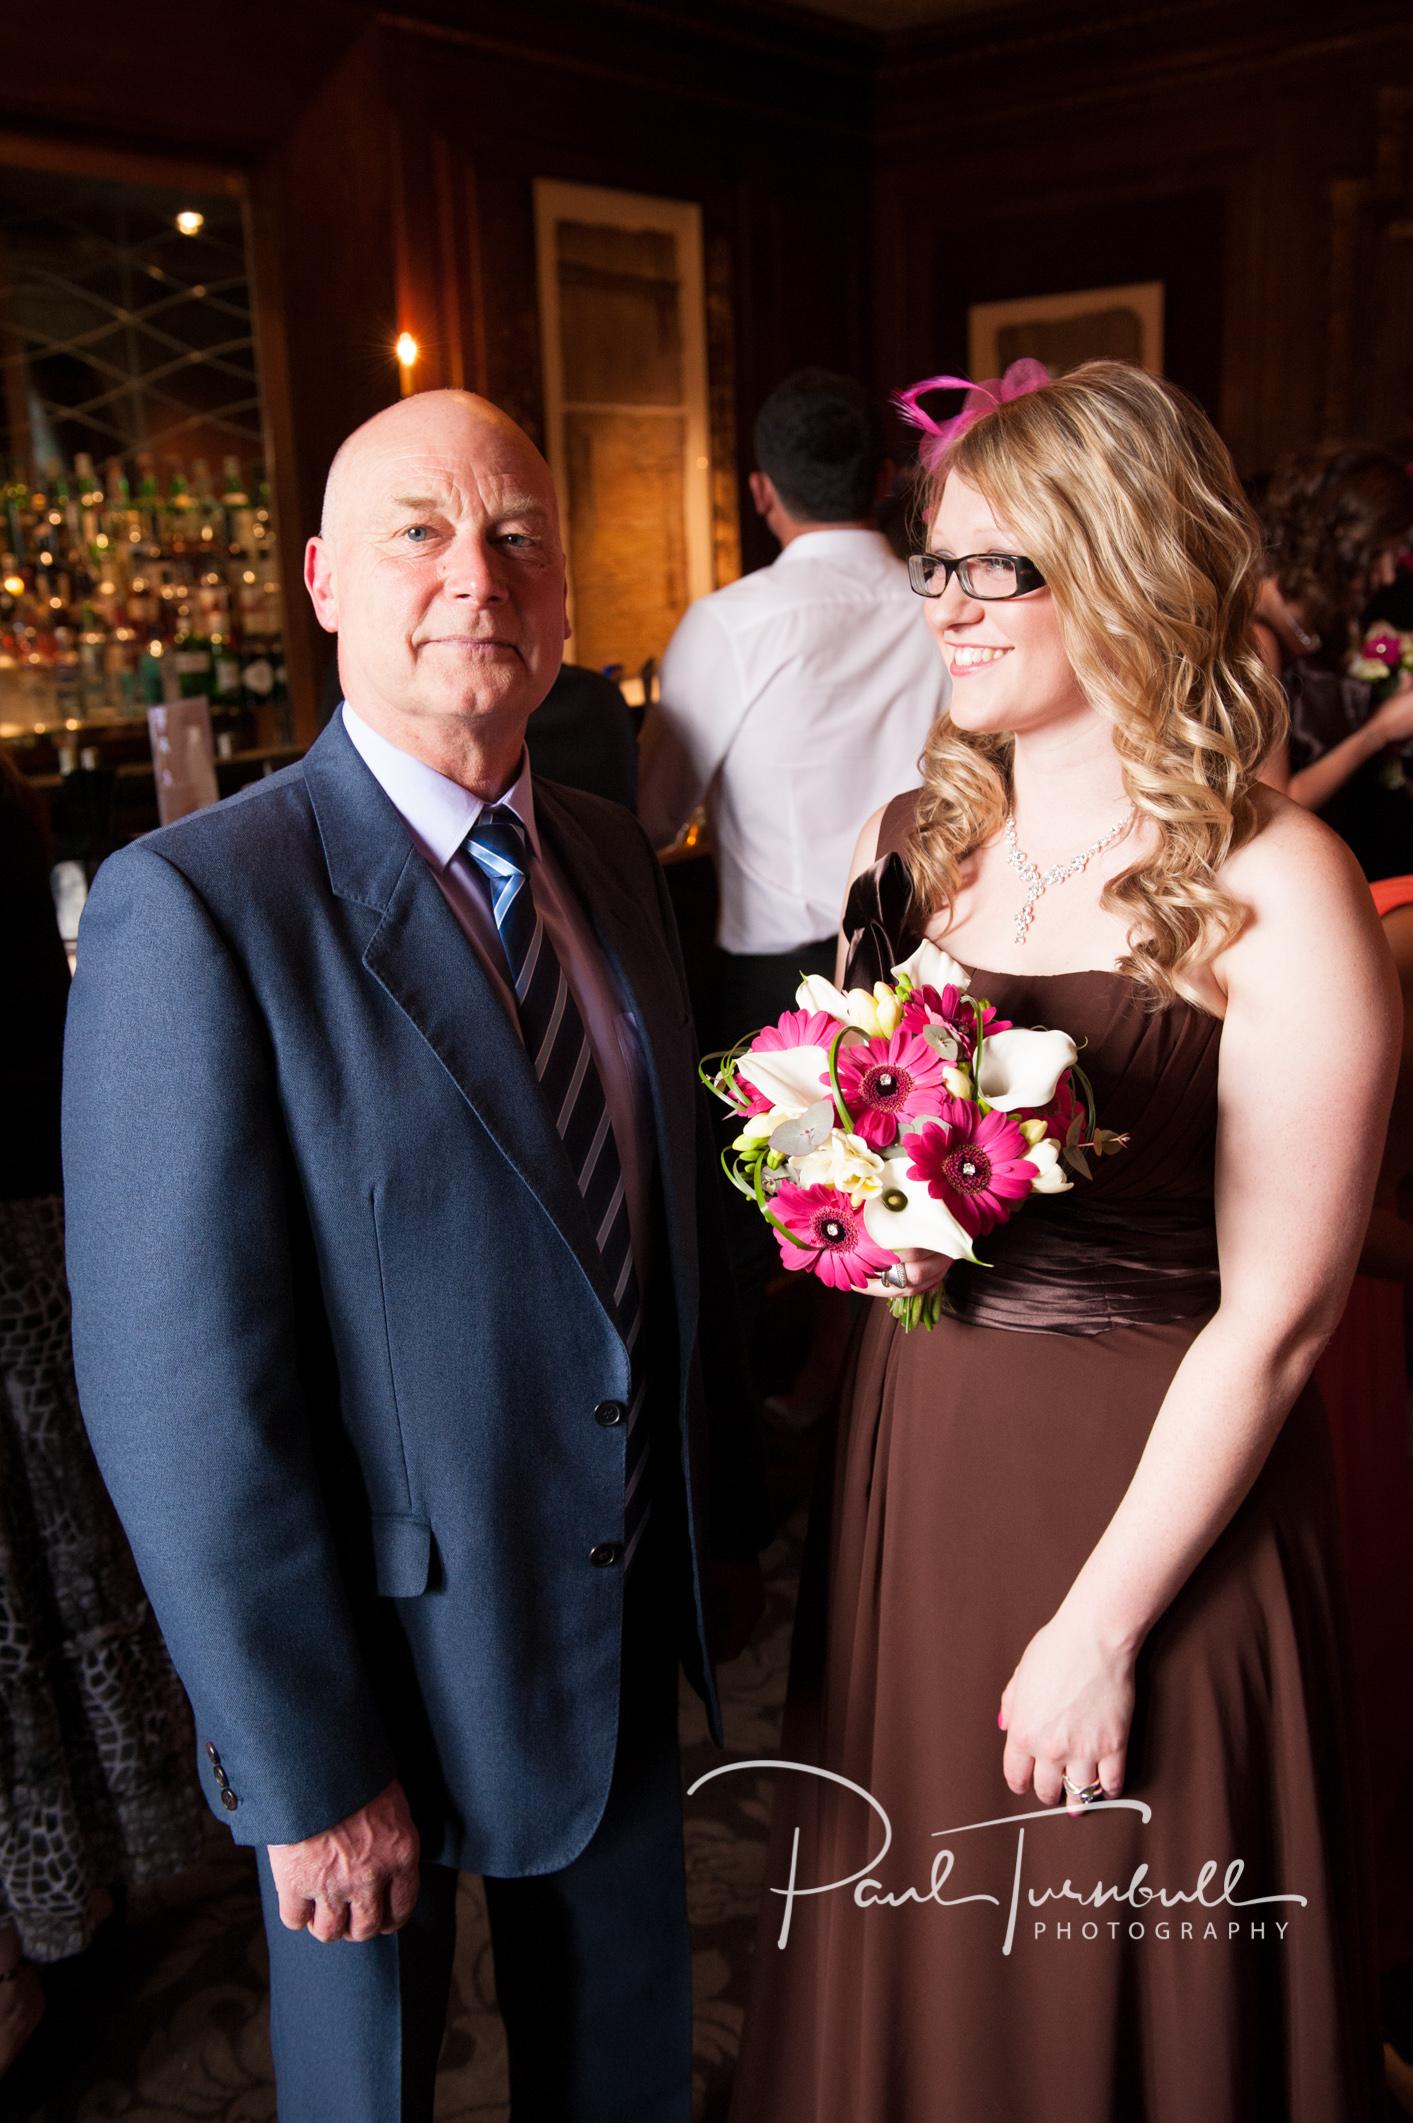 wedding-photography-wood-hall-wetherby-yorkshire-042.jpg